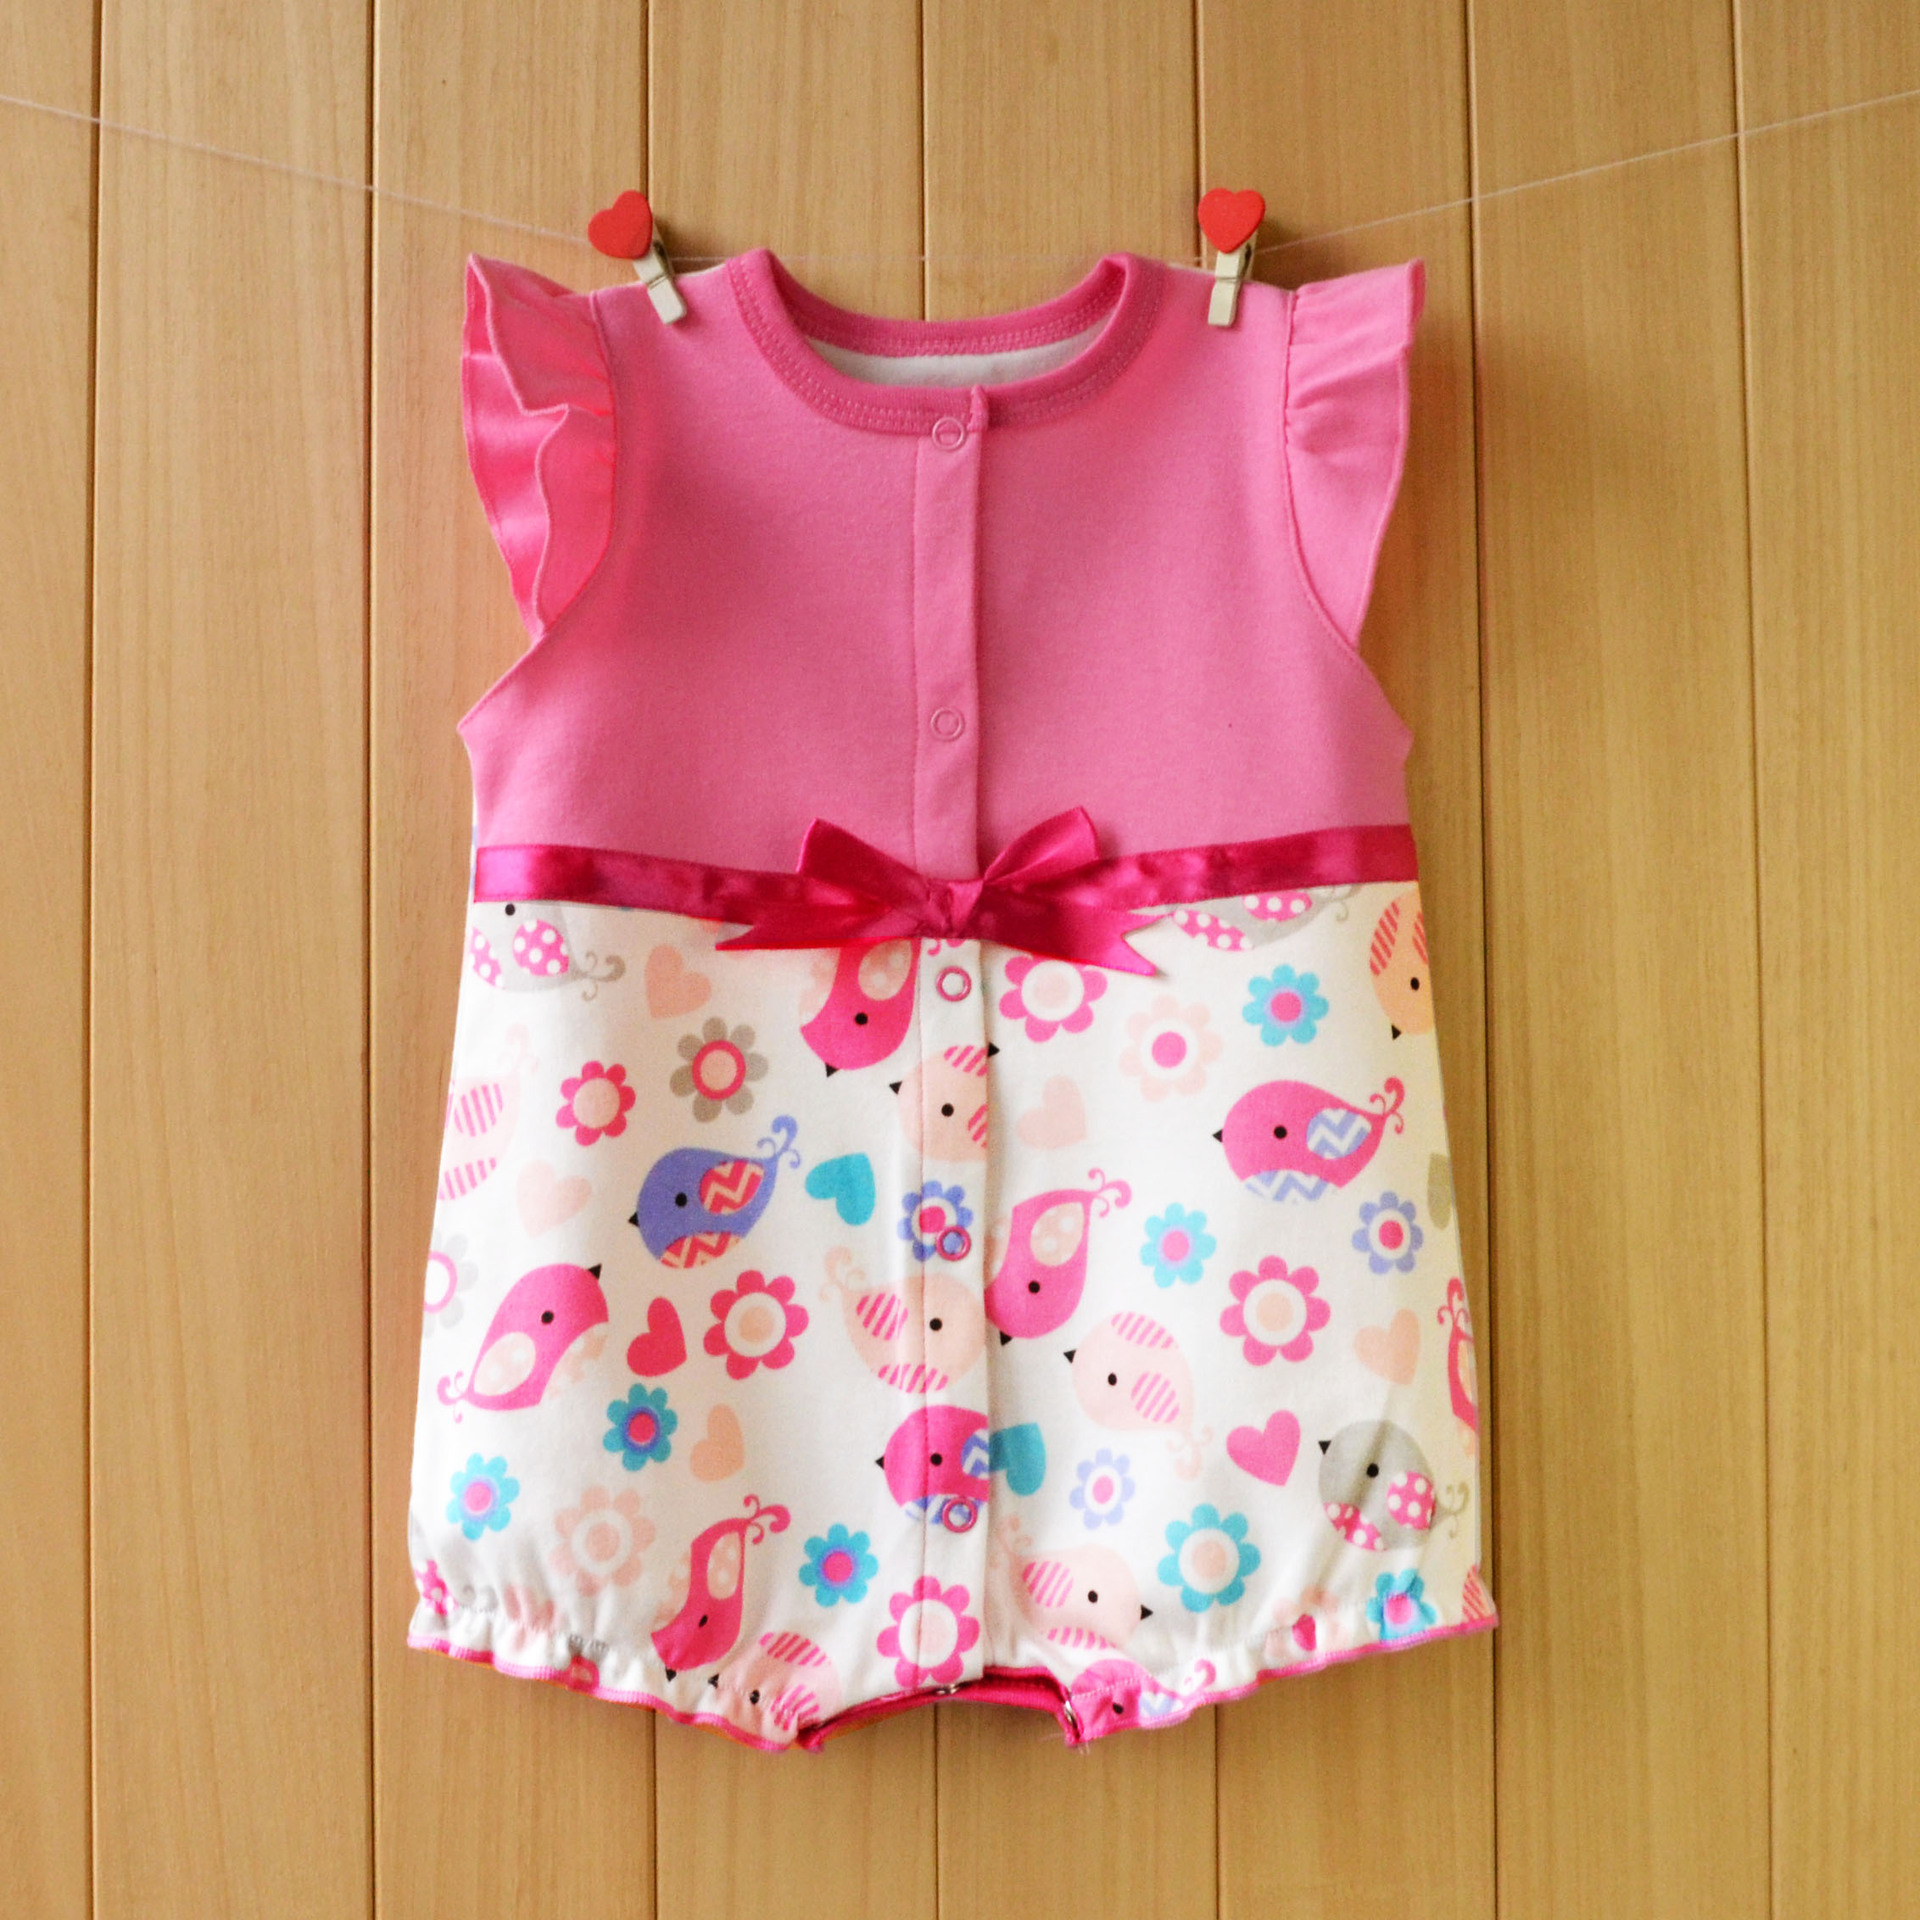 2018 baby clothing summer newborn designer baby clothes girls dress